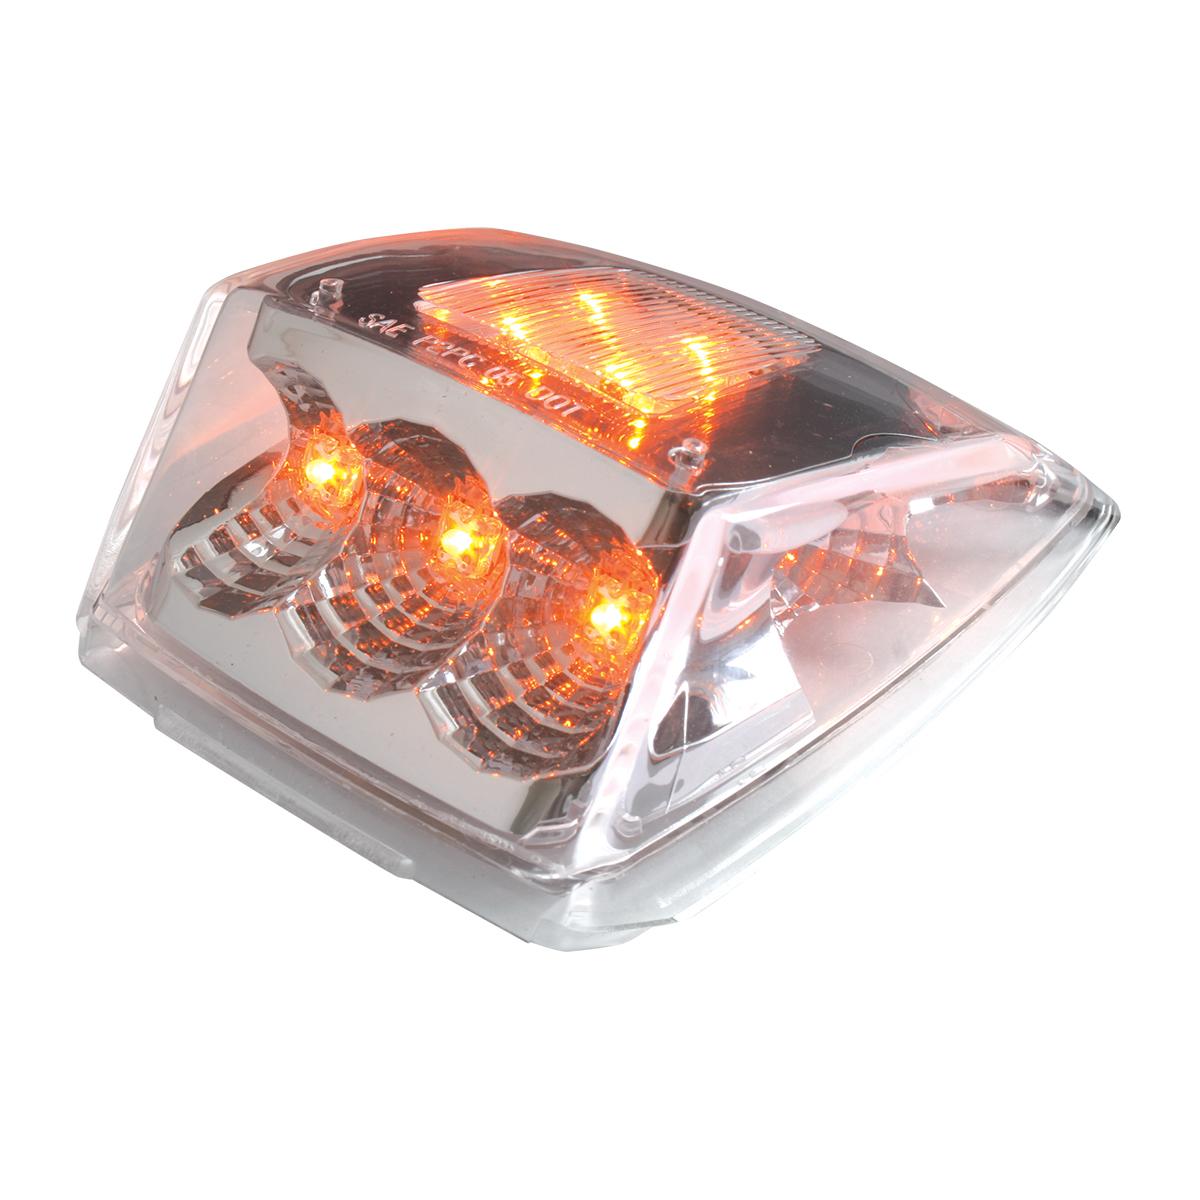 Amber/Clear Cab Spyder LED Marker Light Only for G5K